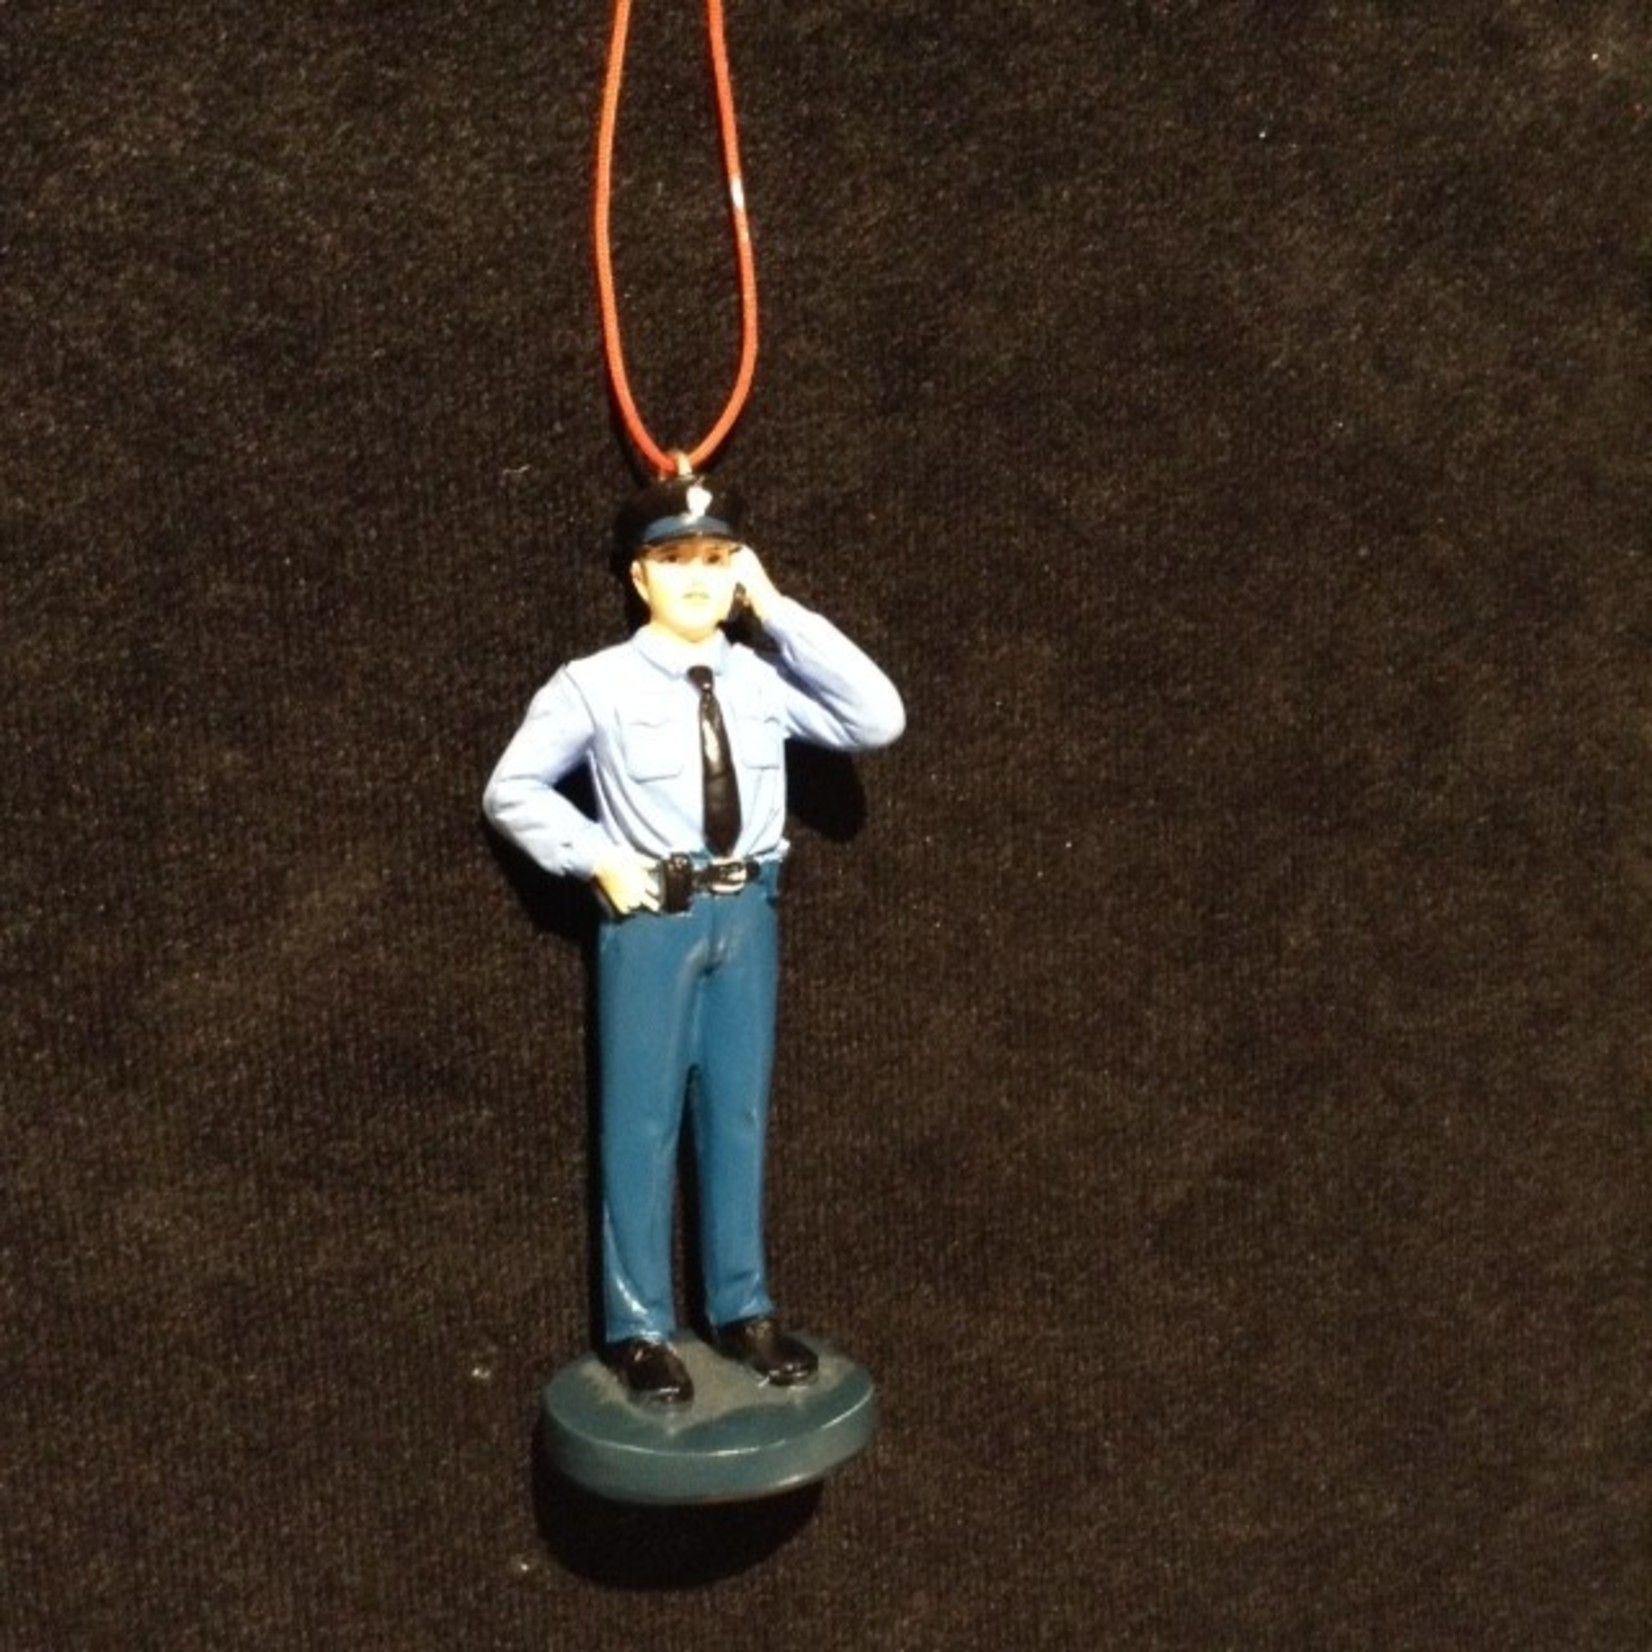 Policeman Ornament